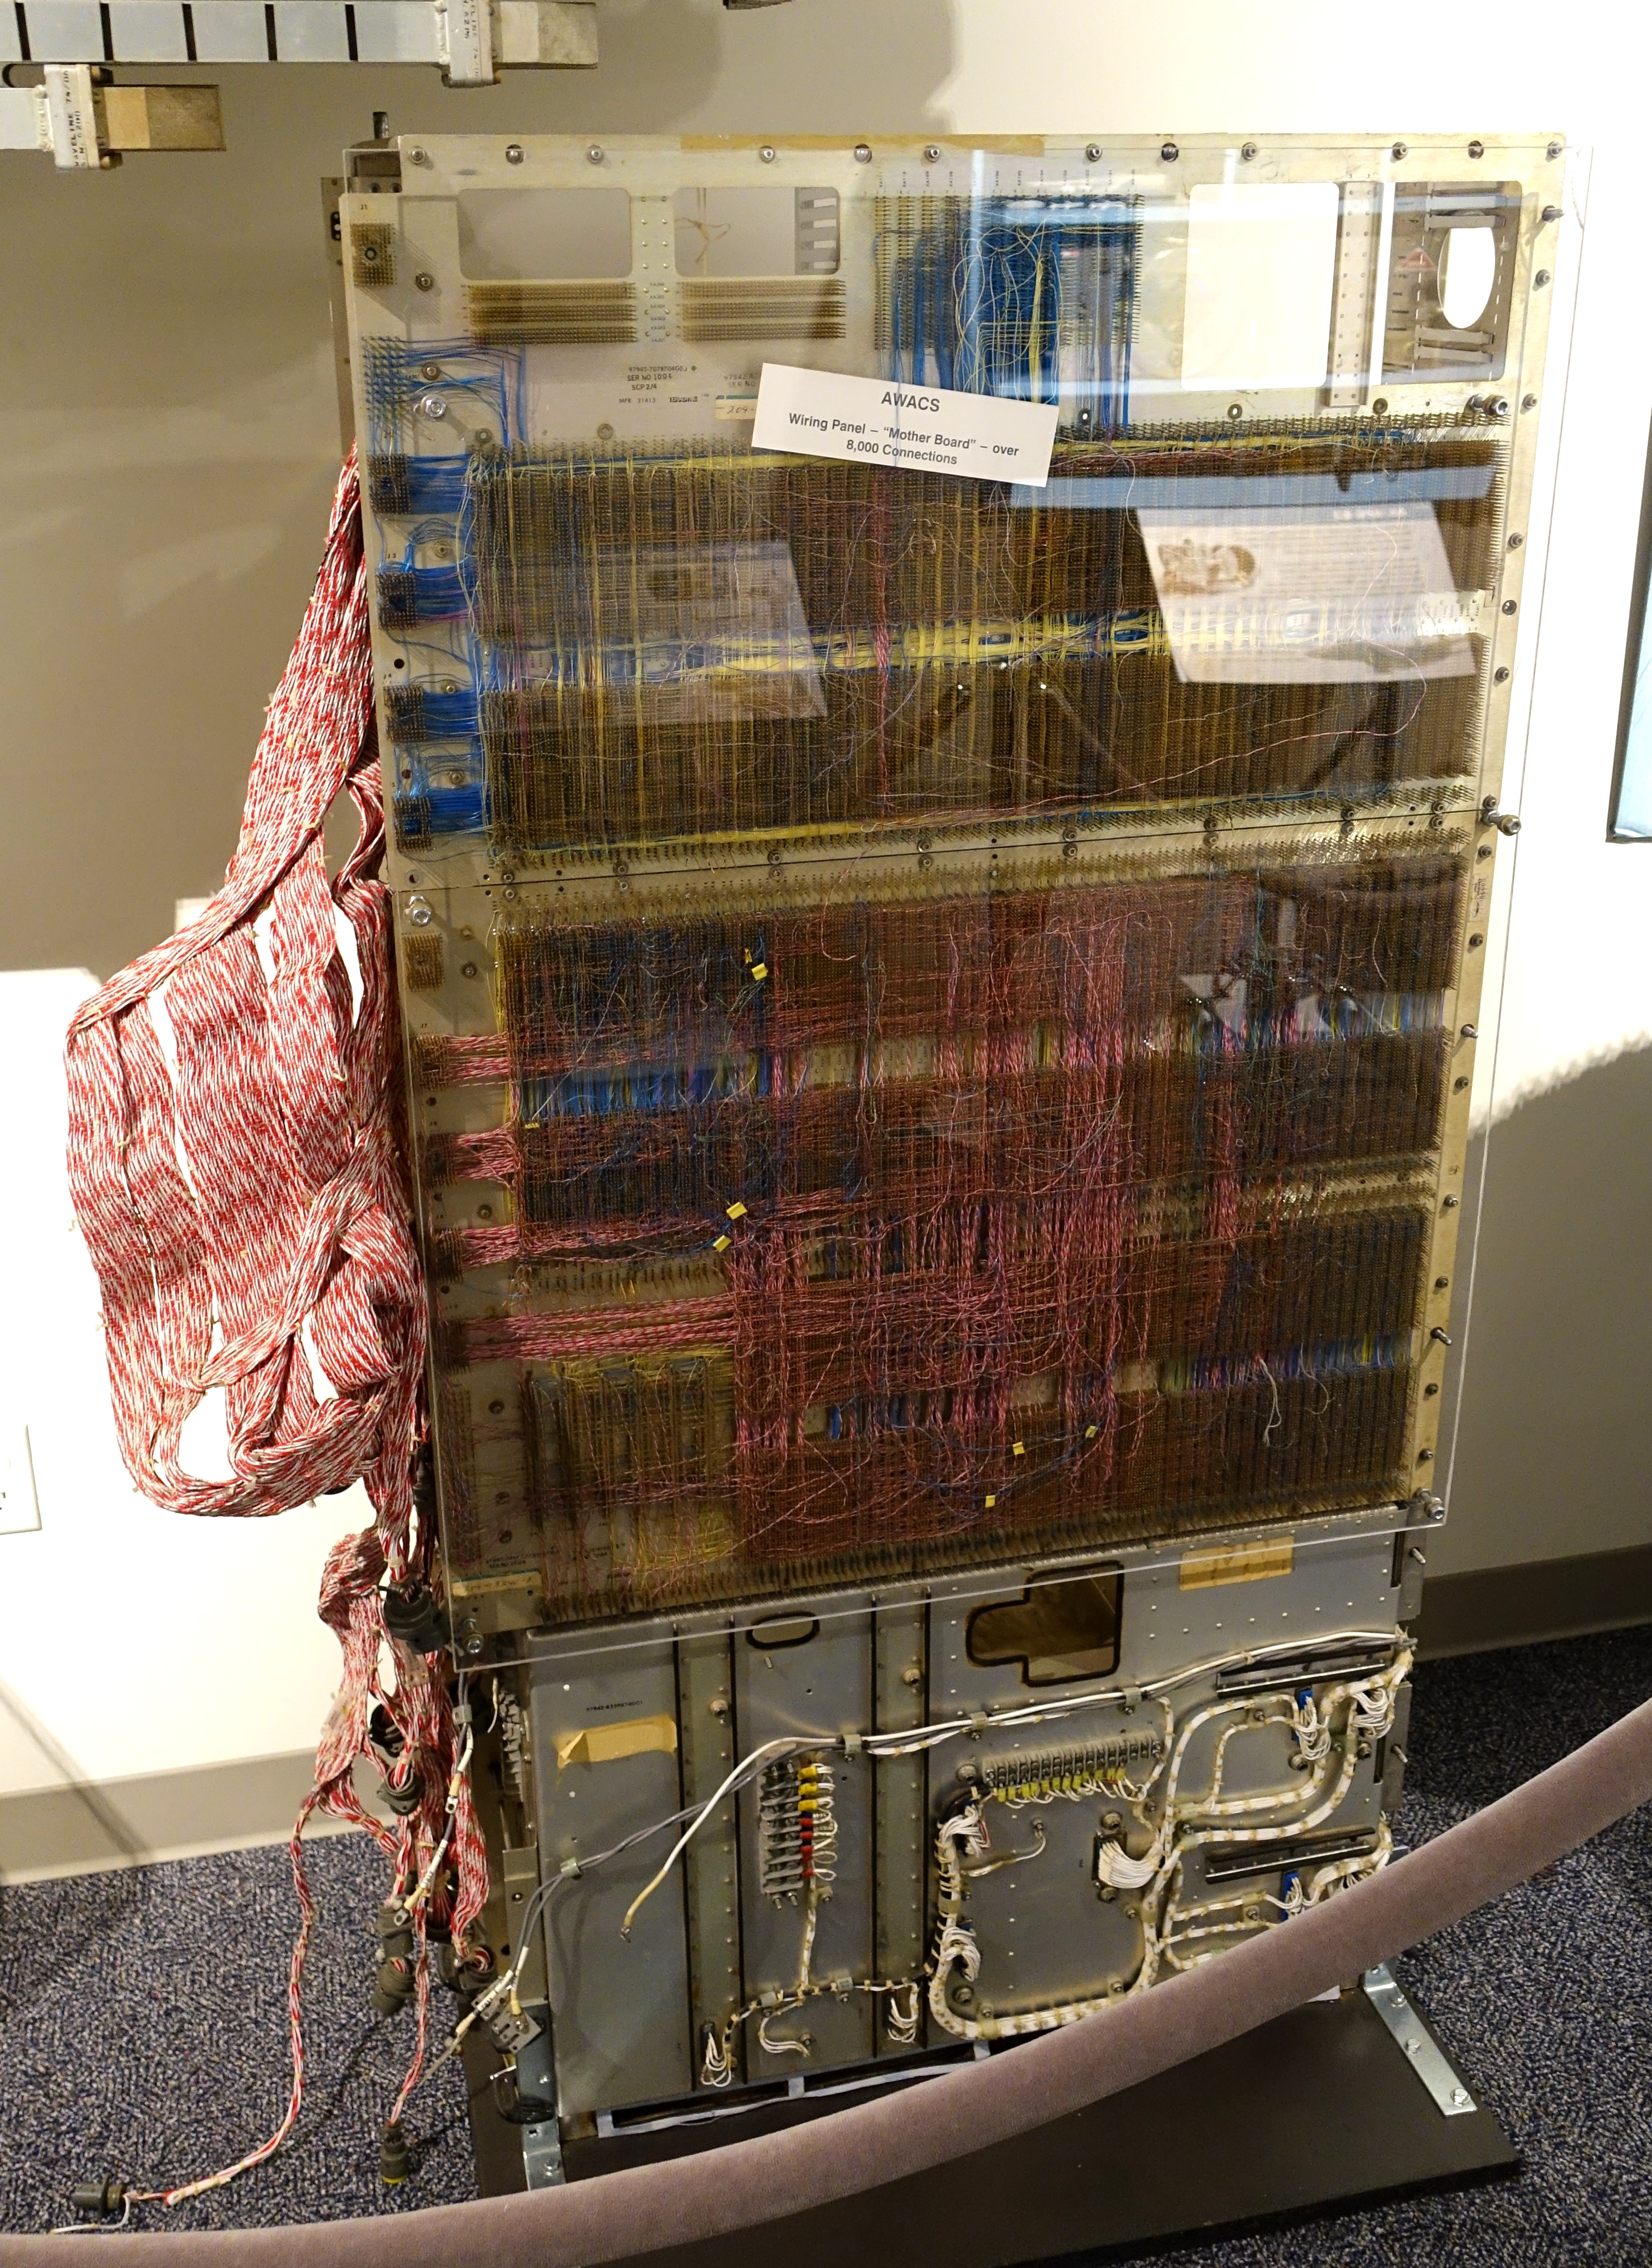 Fileawacs Wiring Panel Mother Board National Electronics Museum Dsc00405